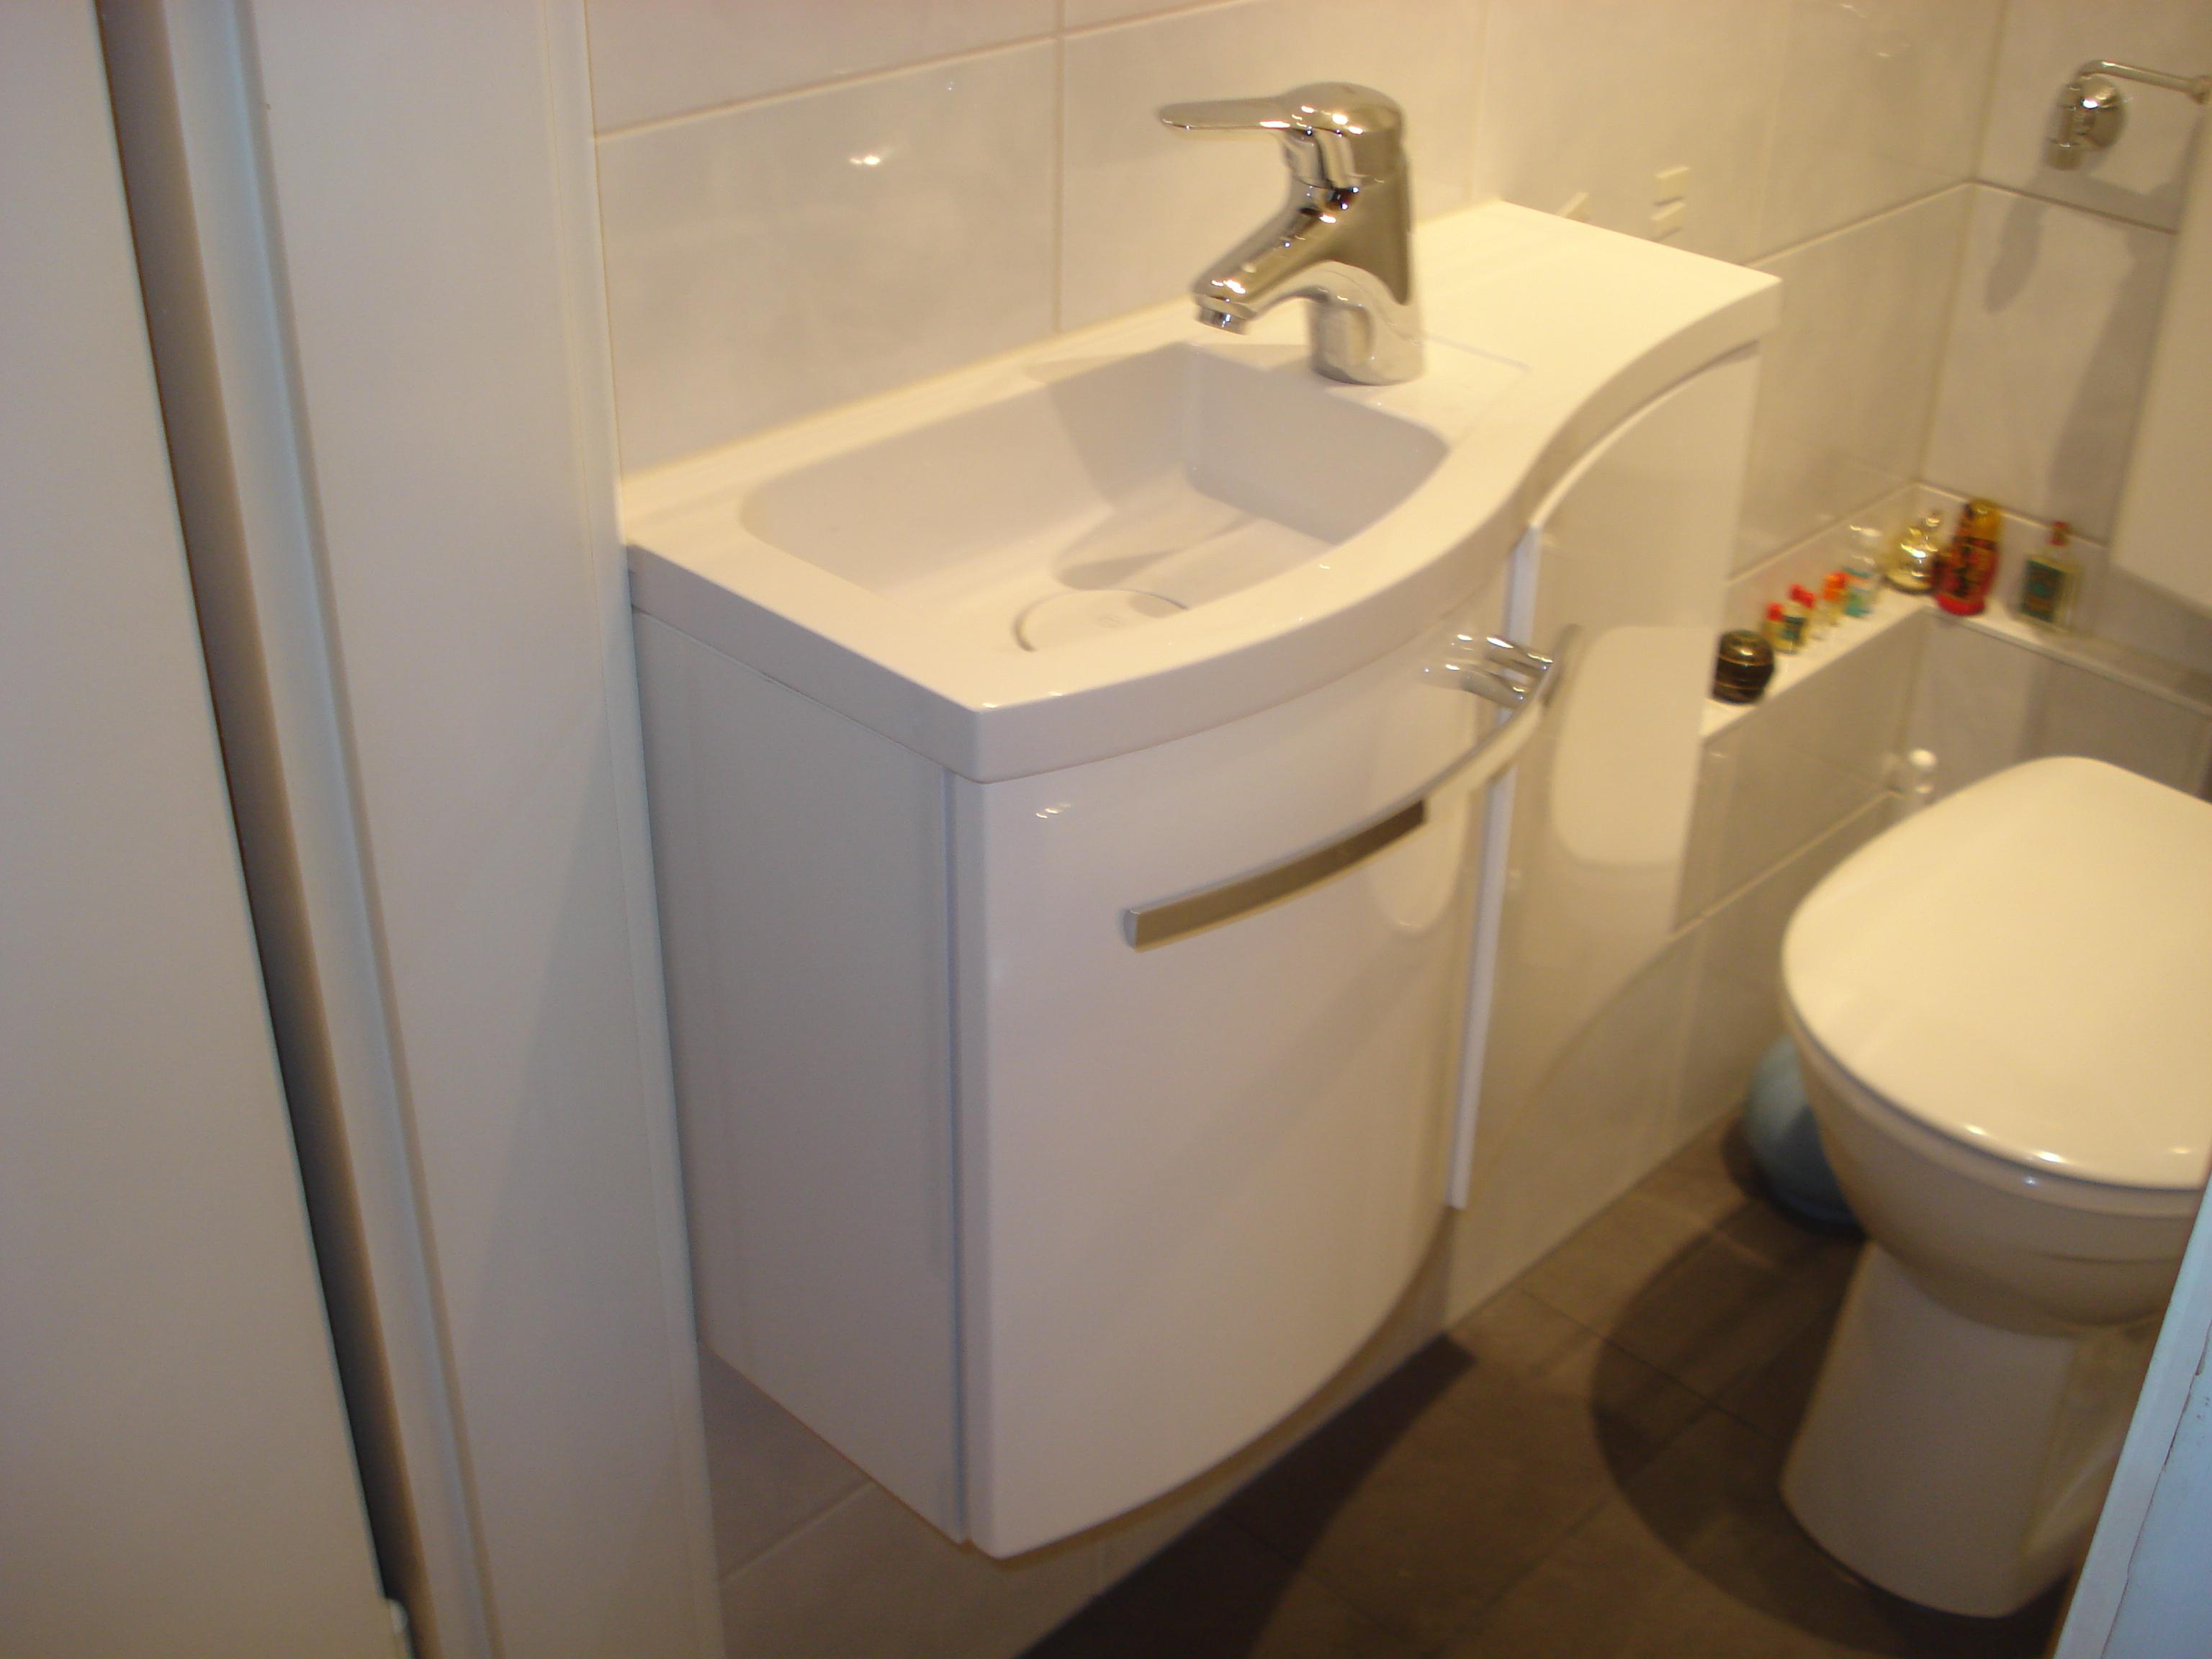 Gaeste wc firma mr bad komplettsanierung augsburg for Bad komplettsanierung